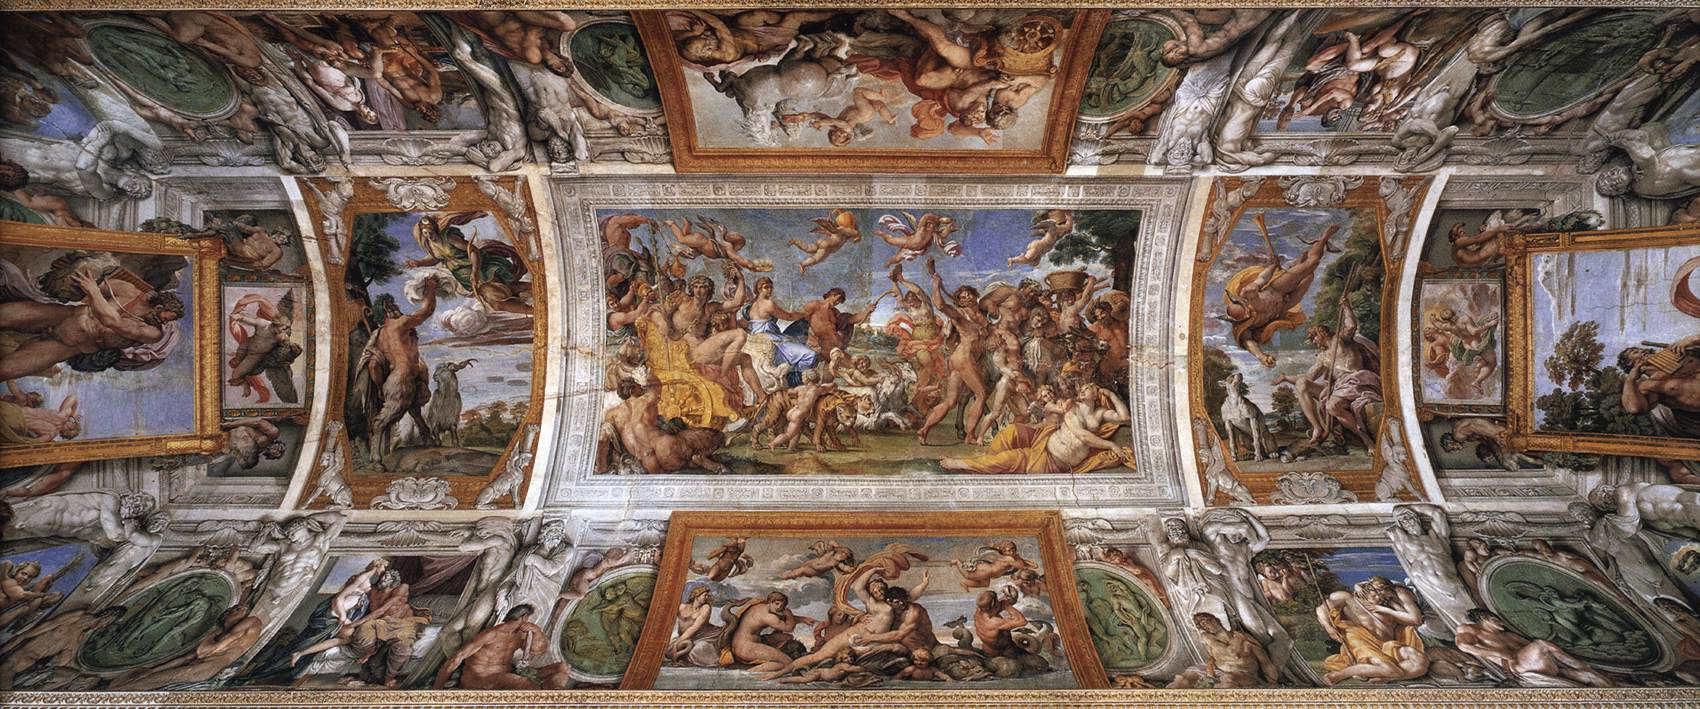 baroque art its features